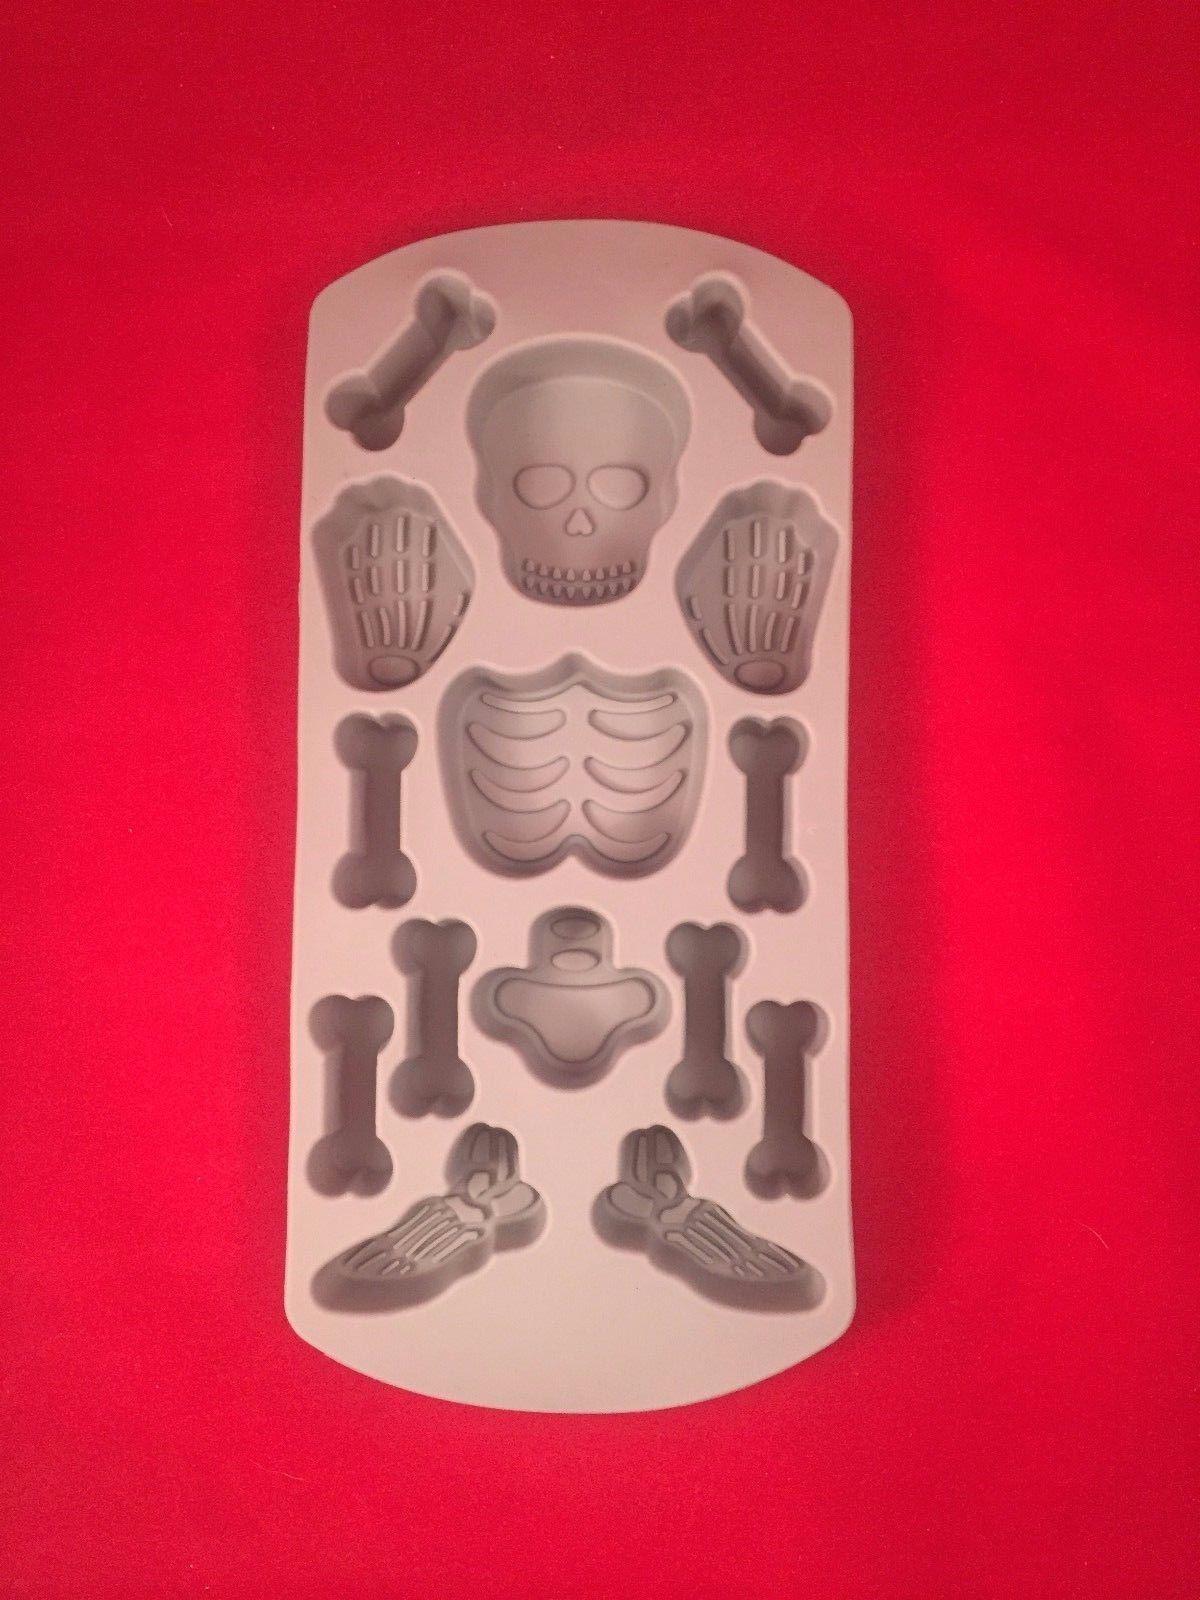 Halloween Skeleton Ice Cube Tray Skull Bones Chocolate Silicone Mold  Decoration